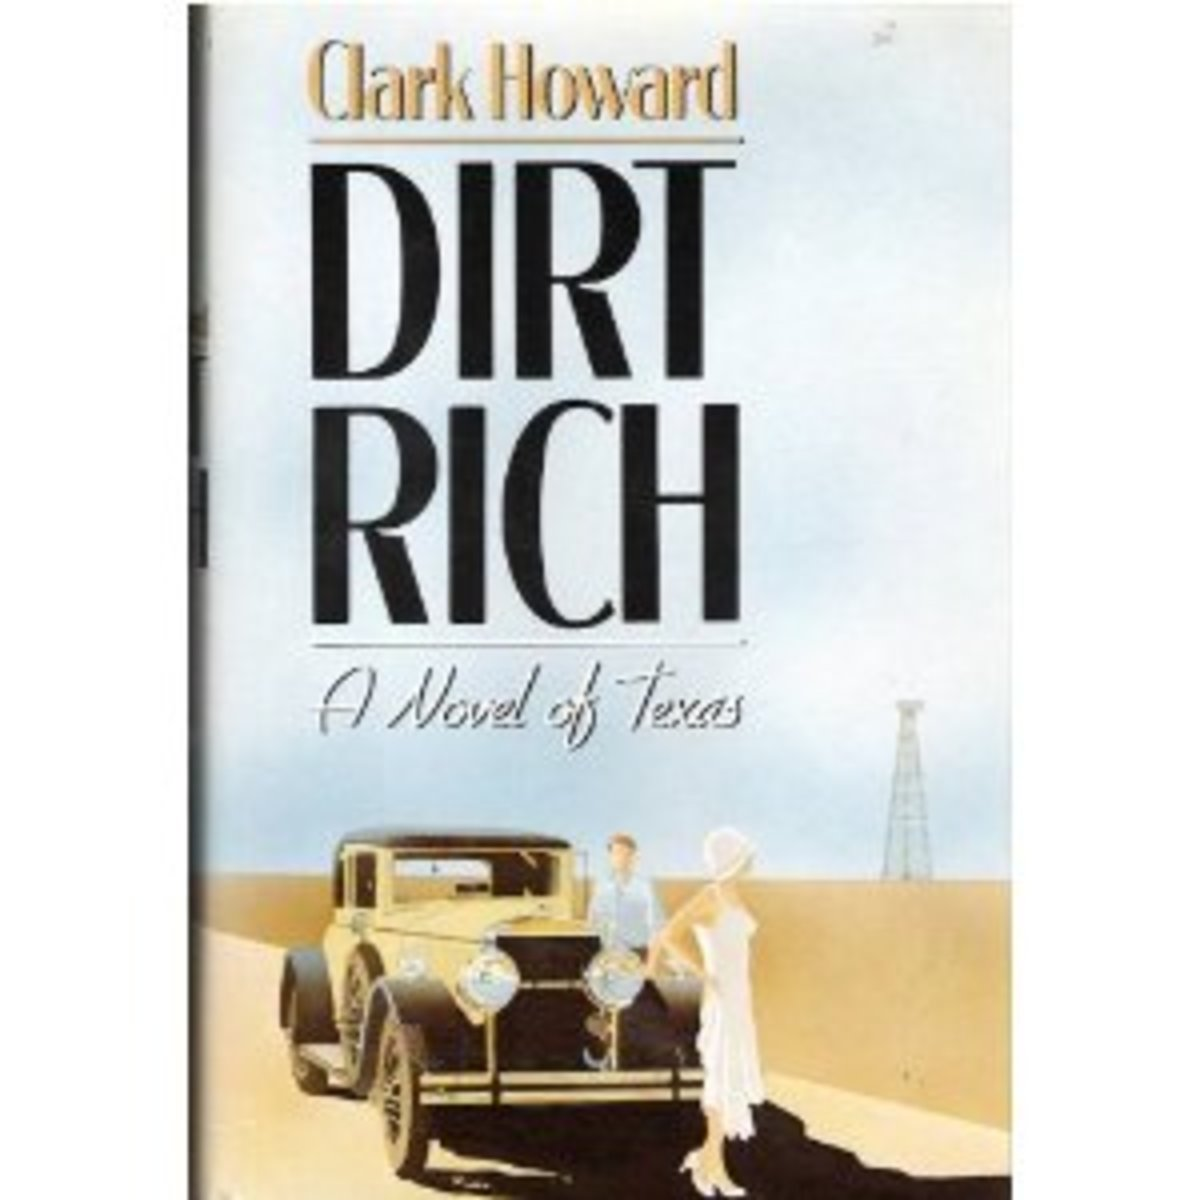 clark-howard-and-his-short-story-under-suspicion